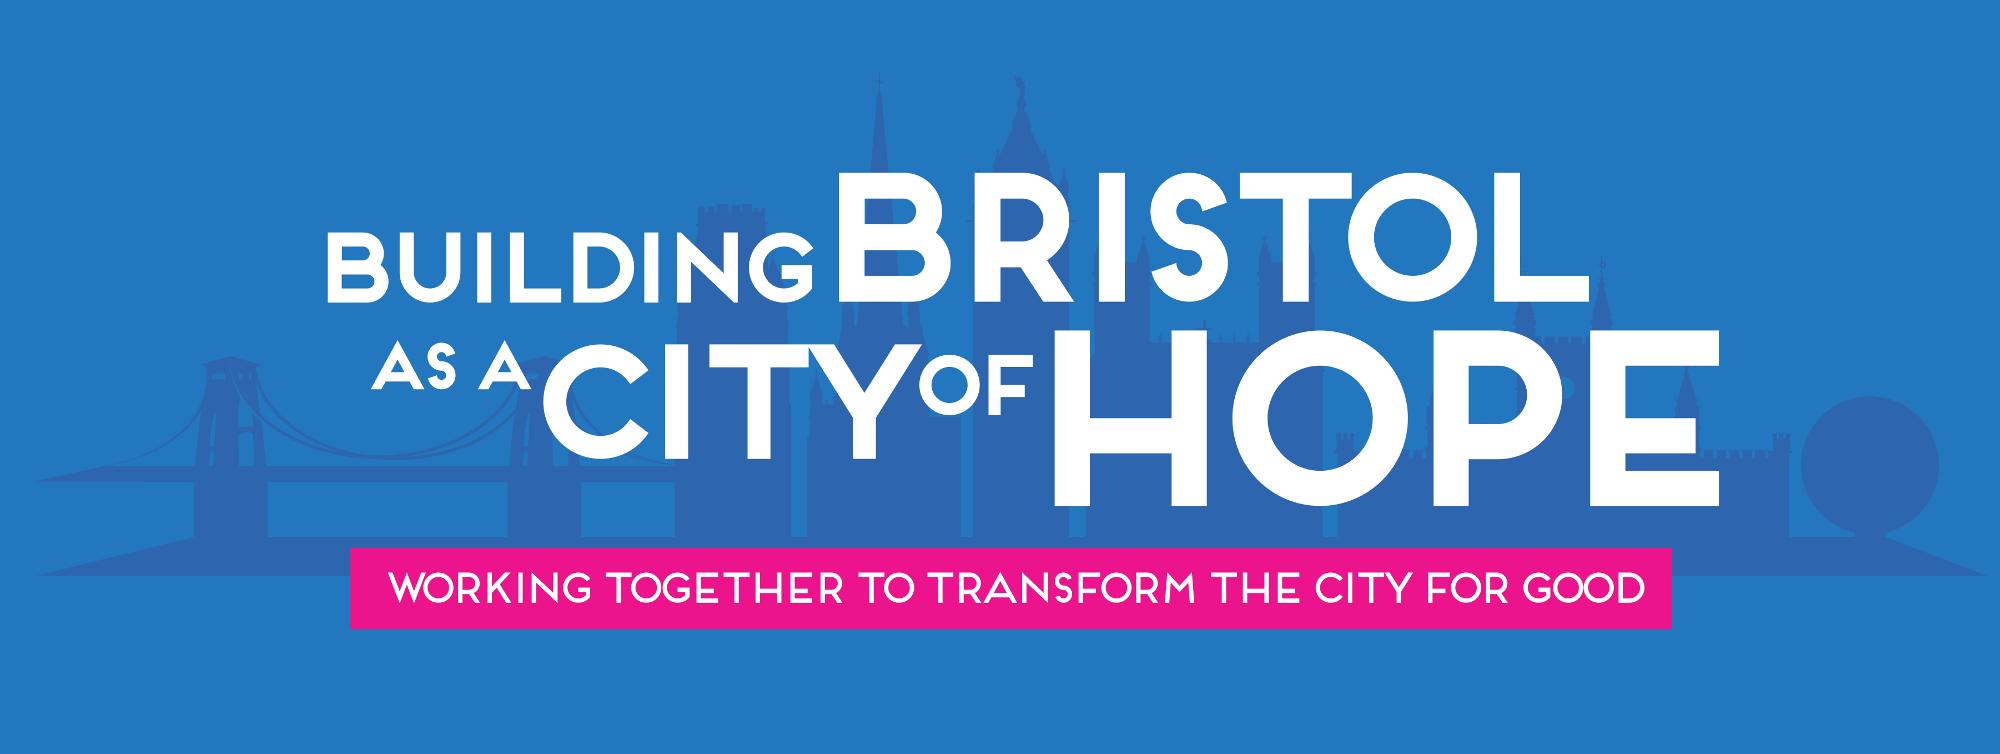 BristolCityofHope8ftx3ft-page-001.jpg